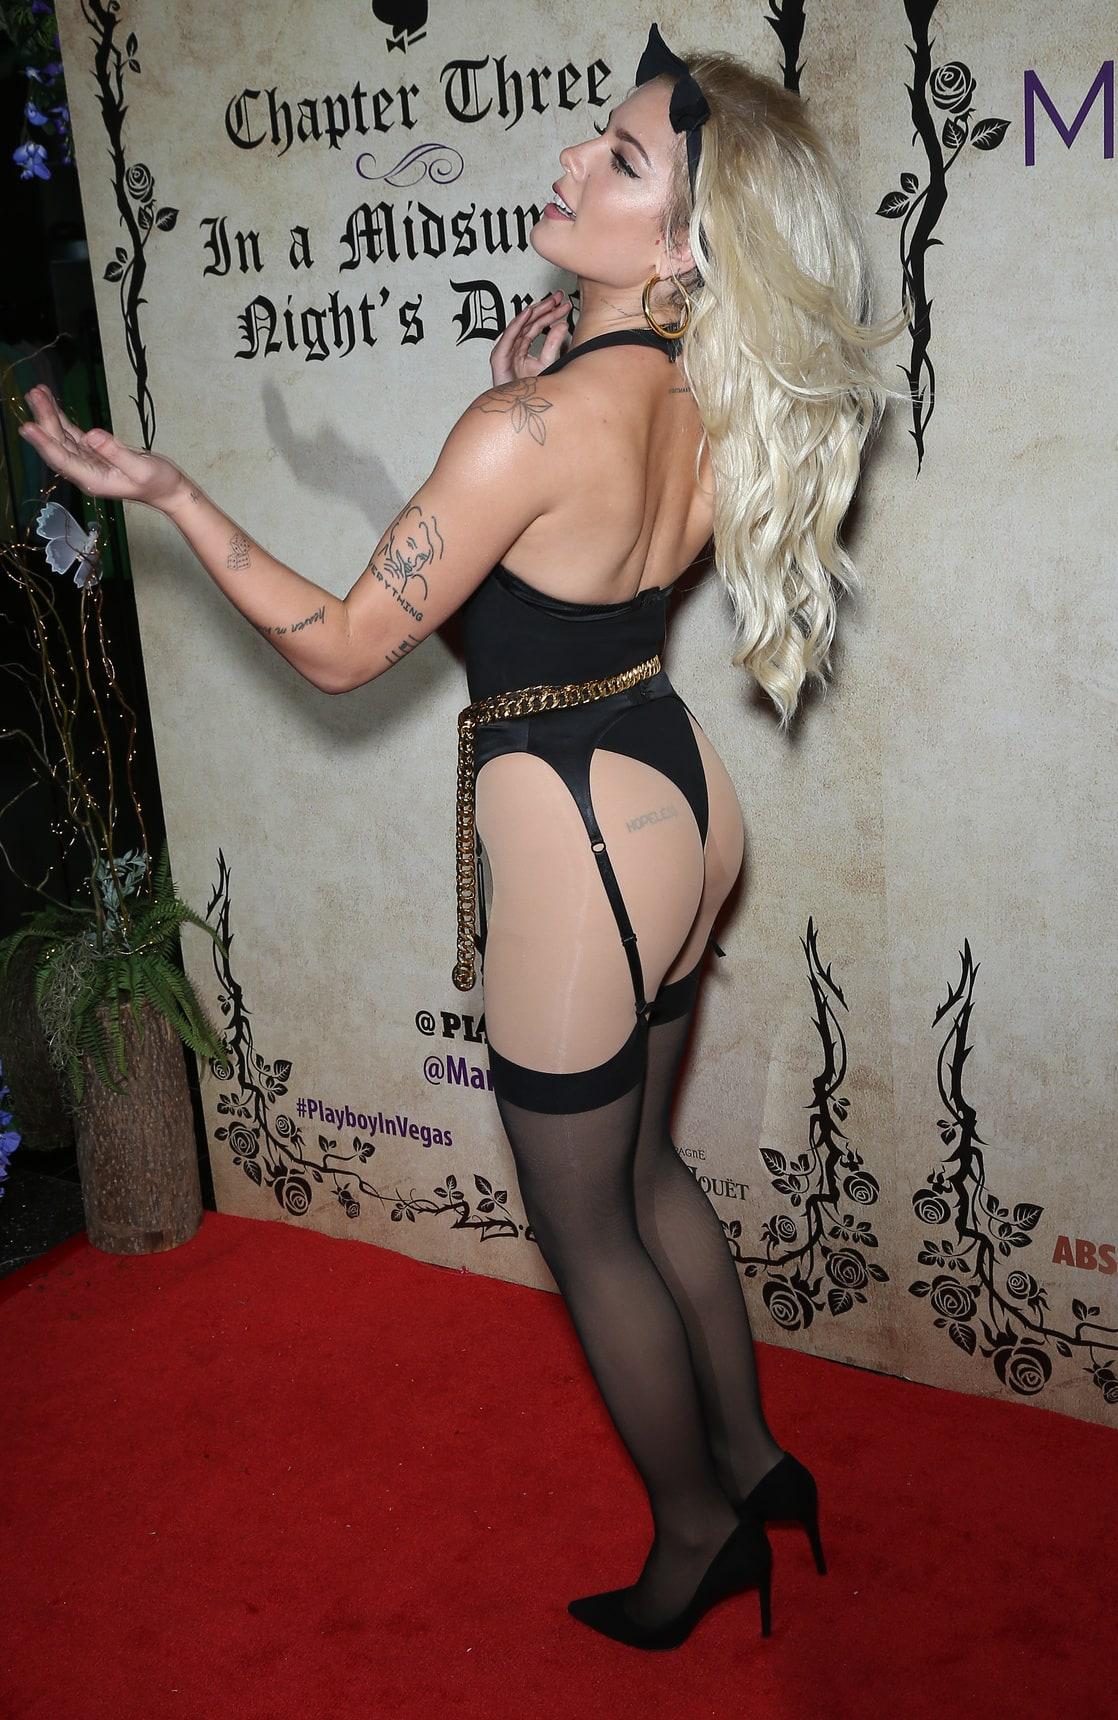 bra Erotica Halsey Braless naked photo 2017